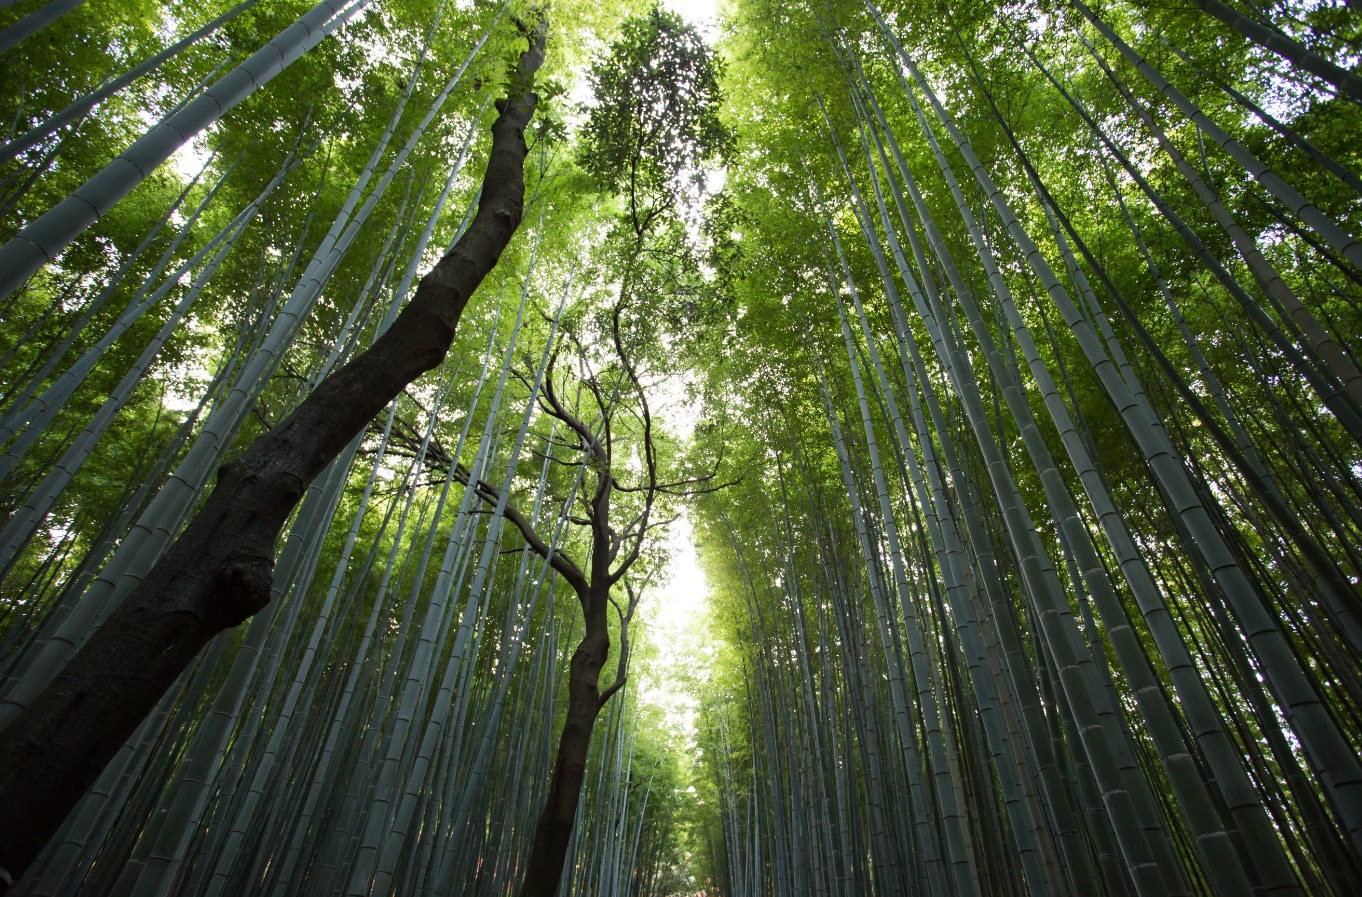 Greening the world, tree by tree, survey by survey